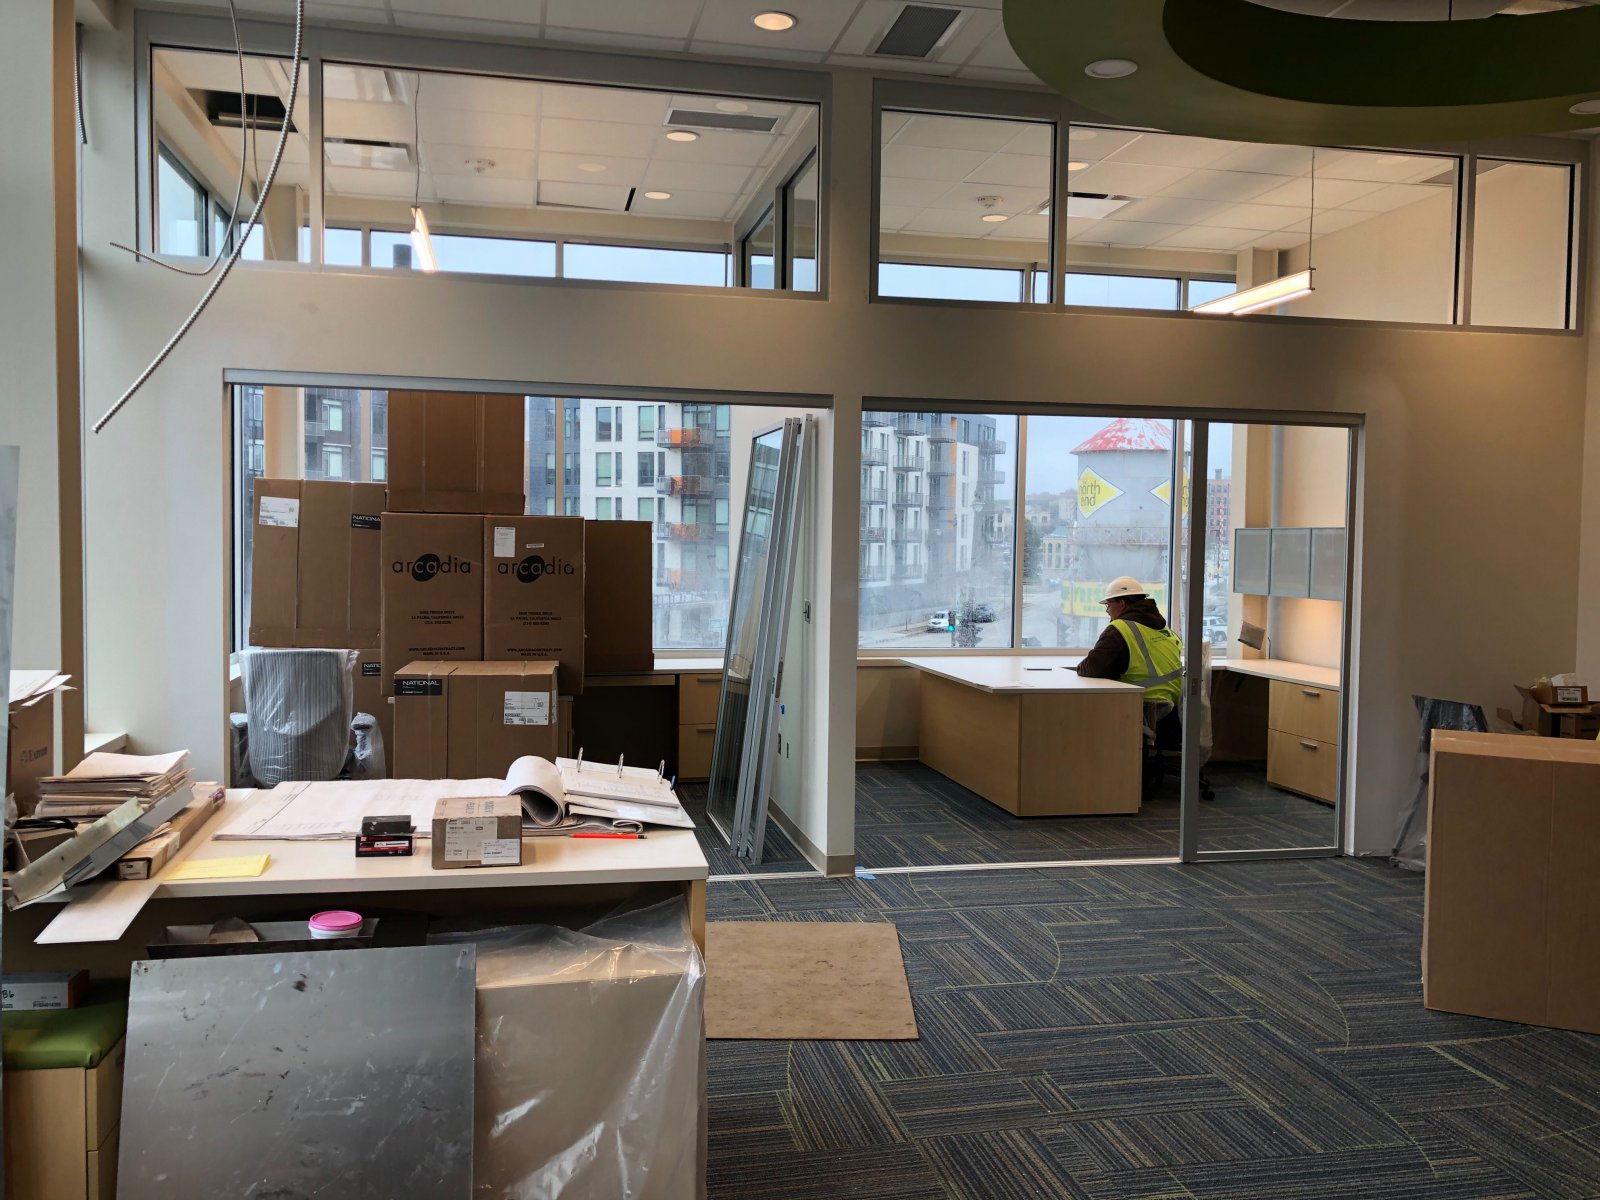 North Shore Bank - Downtown Branch Interior